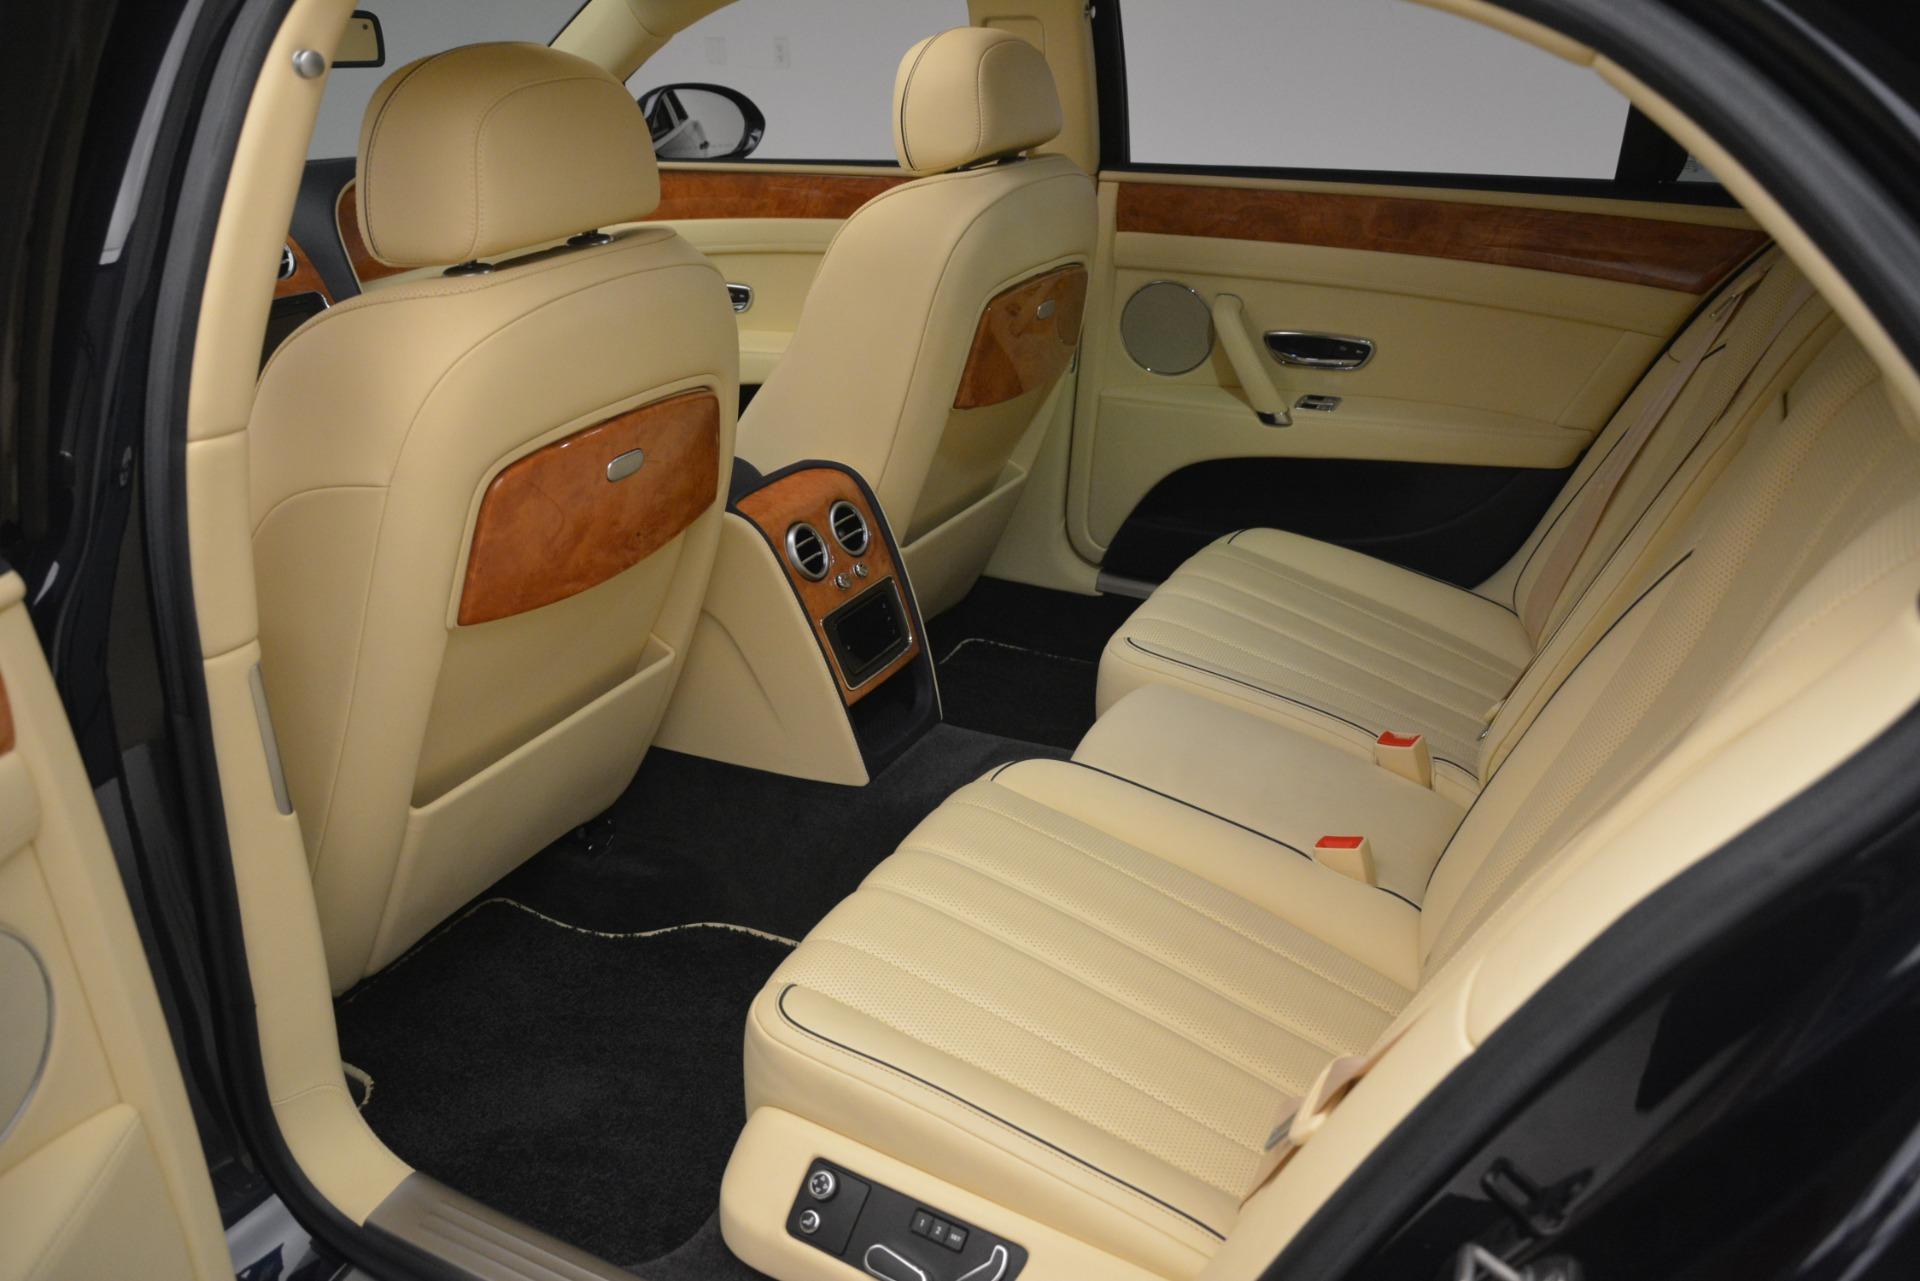 Used 2015 Bentley Flying Spur V8 For Sale In Westport, CT 2997_p23